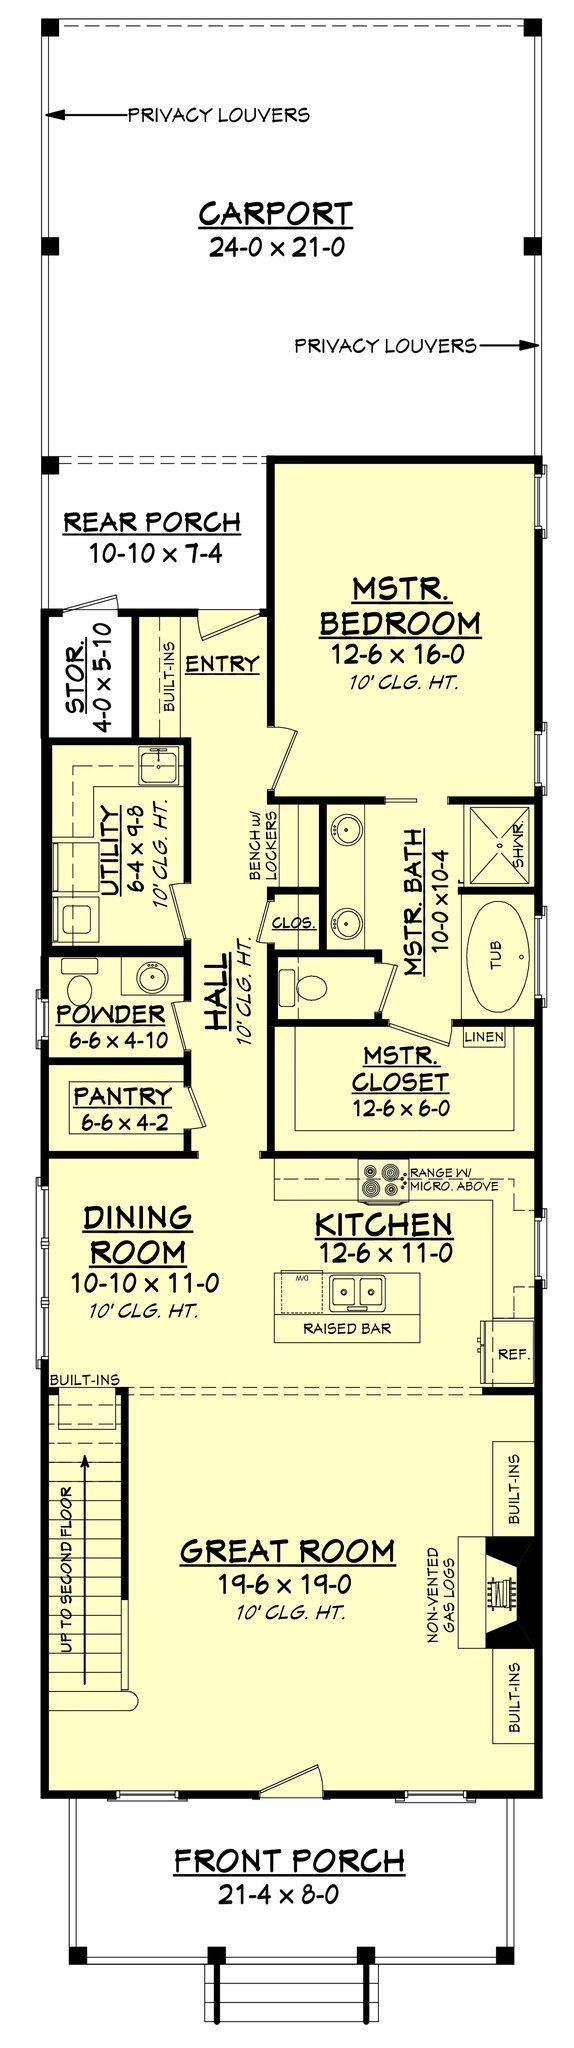 best 25 small narrow bathroom ideas on pinterest narrow best 25 small narrow bathroom ideas on pinterest narrow bathroom long narrow bathroom and small shower room